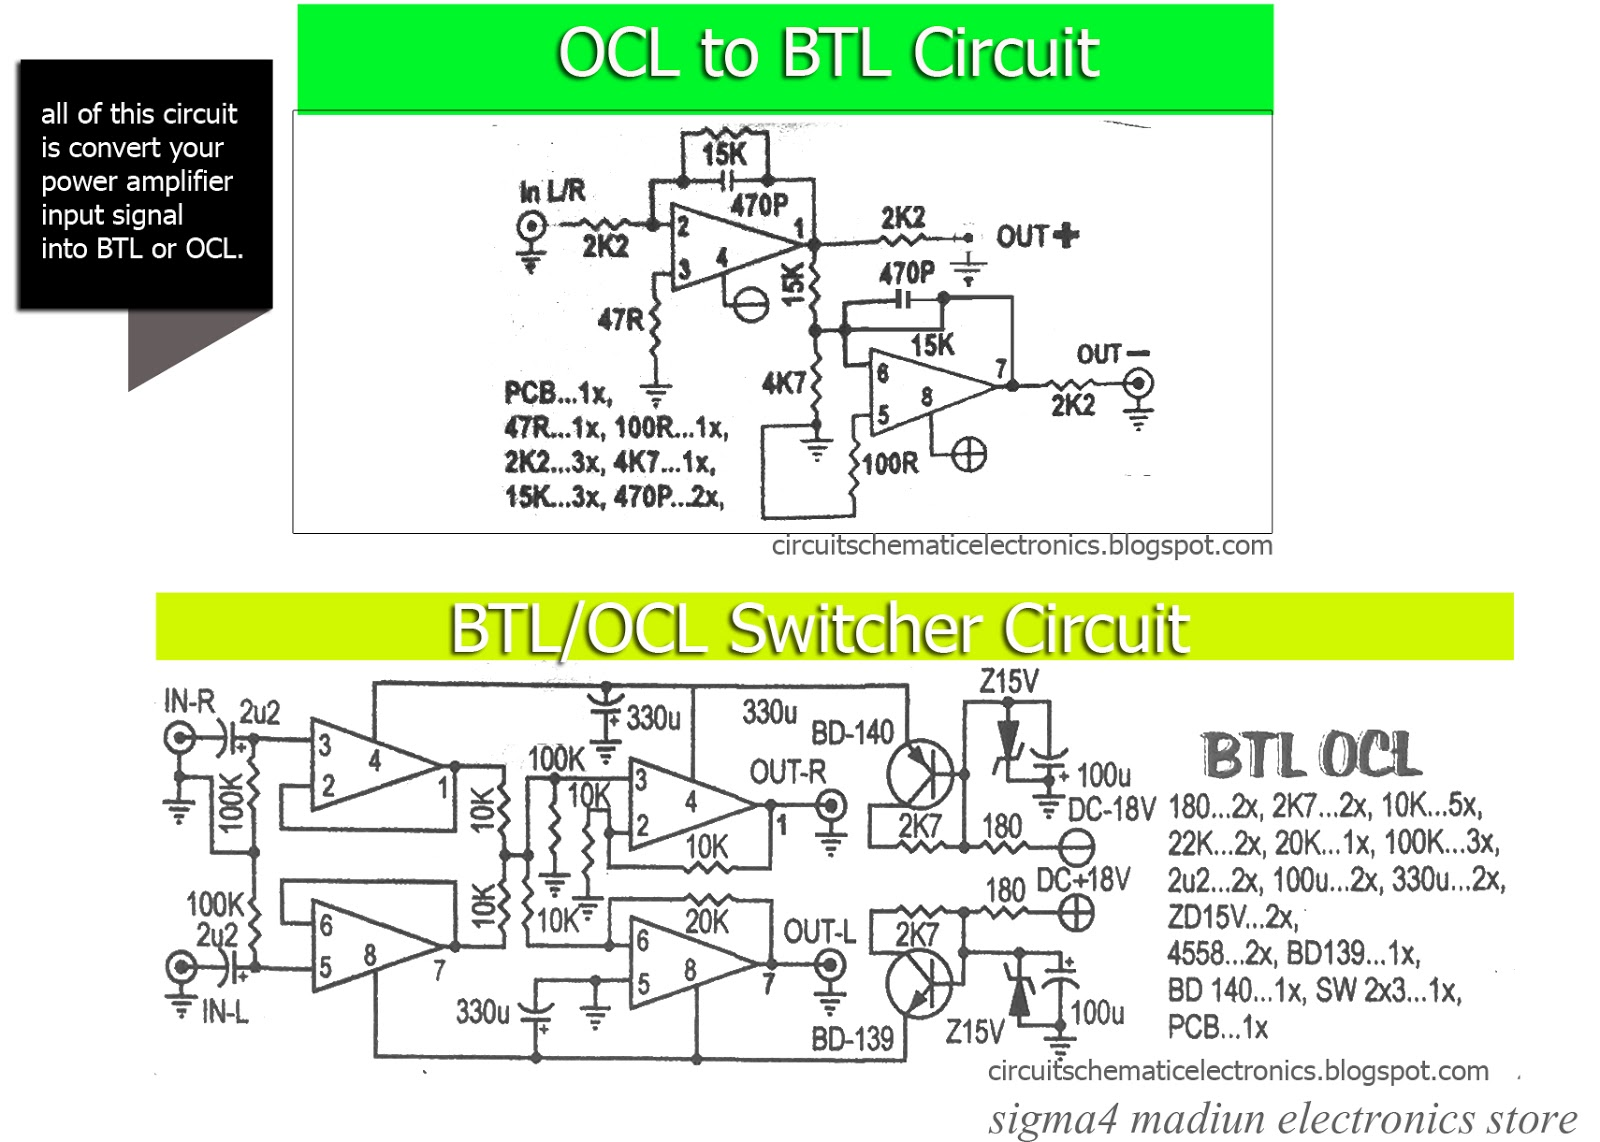 2000 Watts Power Amplifier Schematic Diagram 4 Prong Relay Wiring 1000w Schematics Get Free Image About